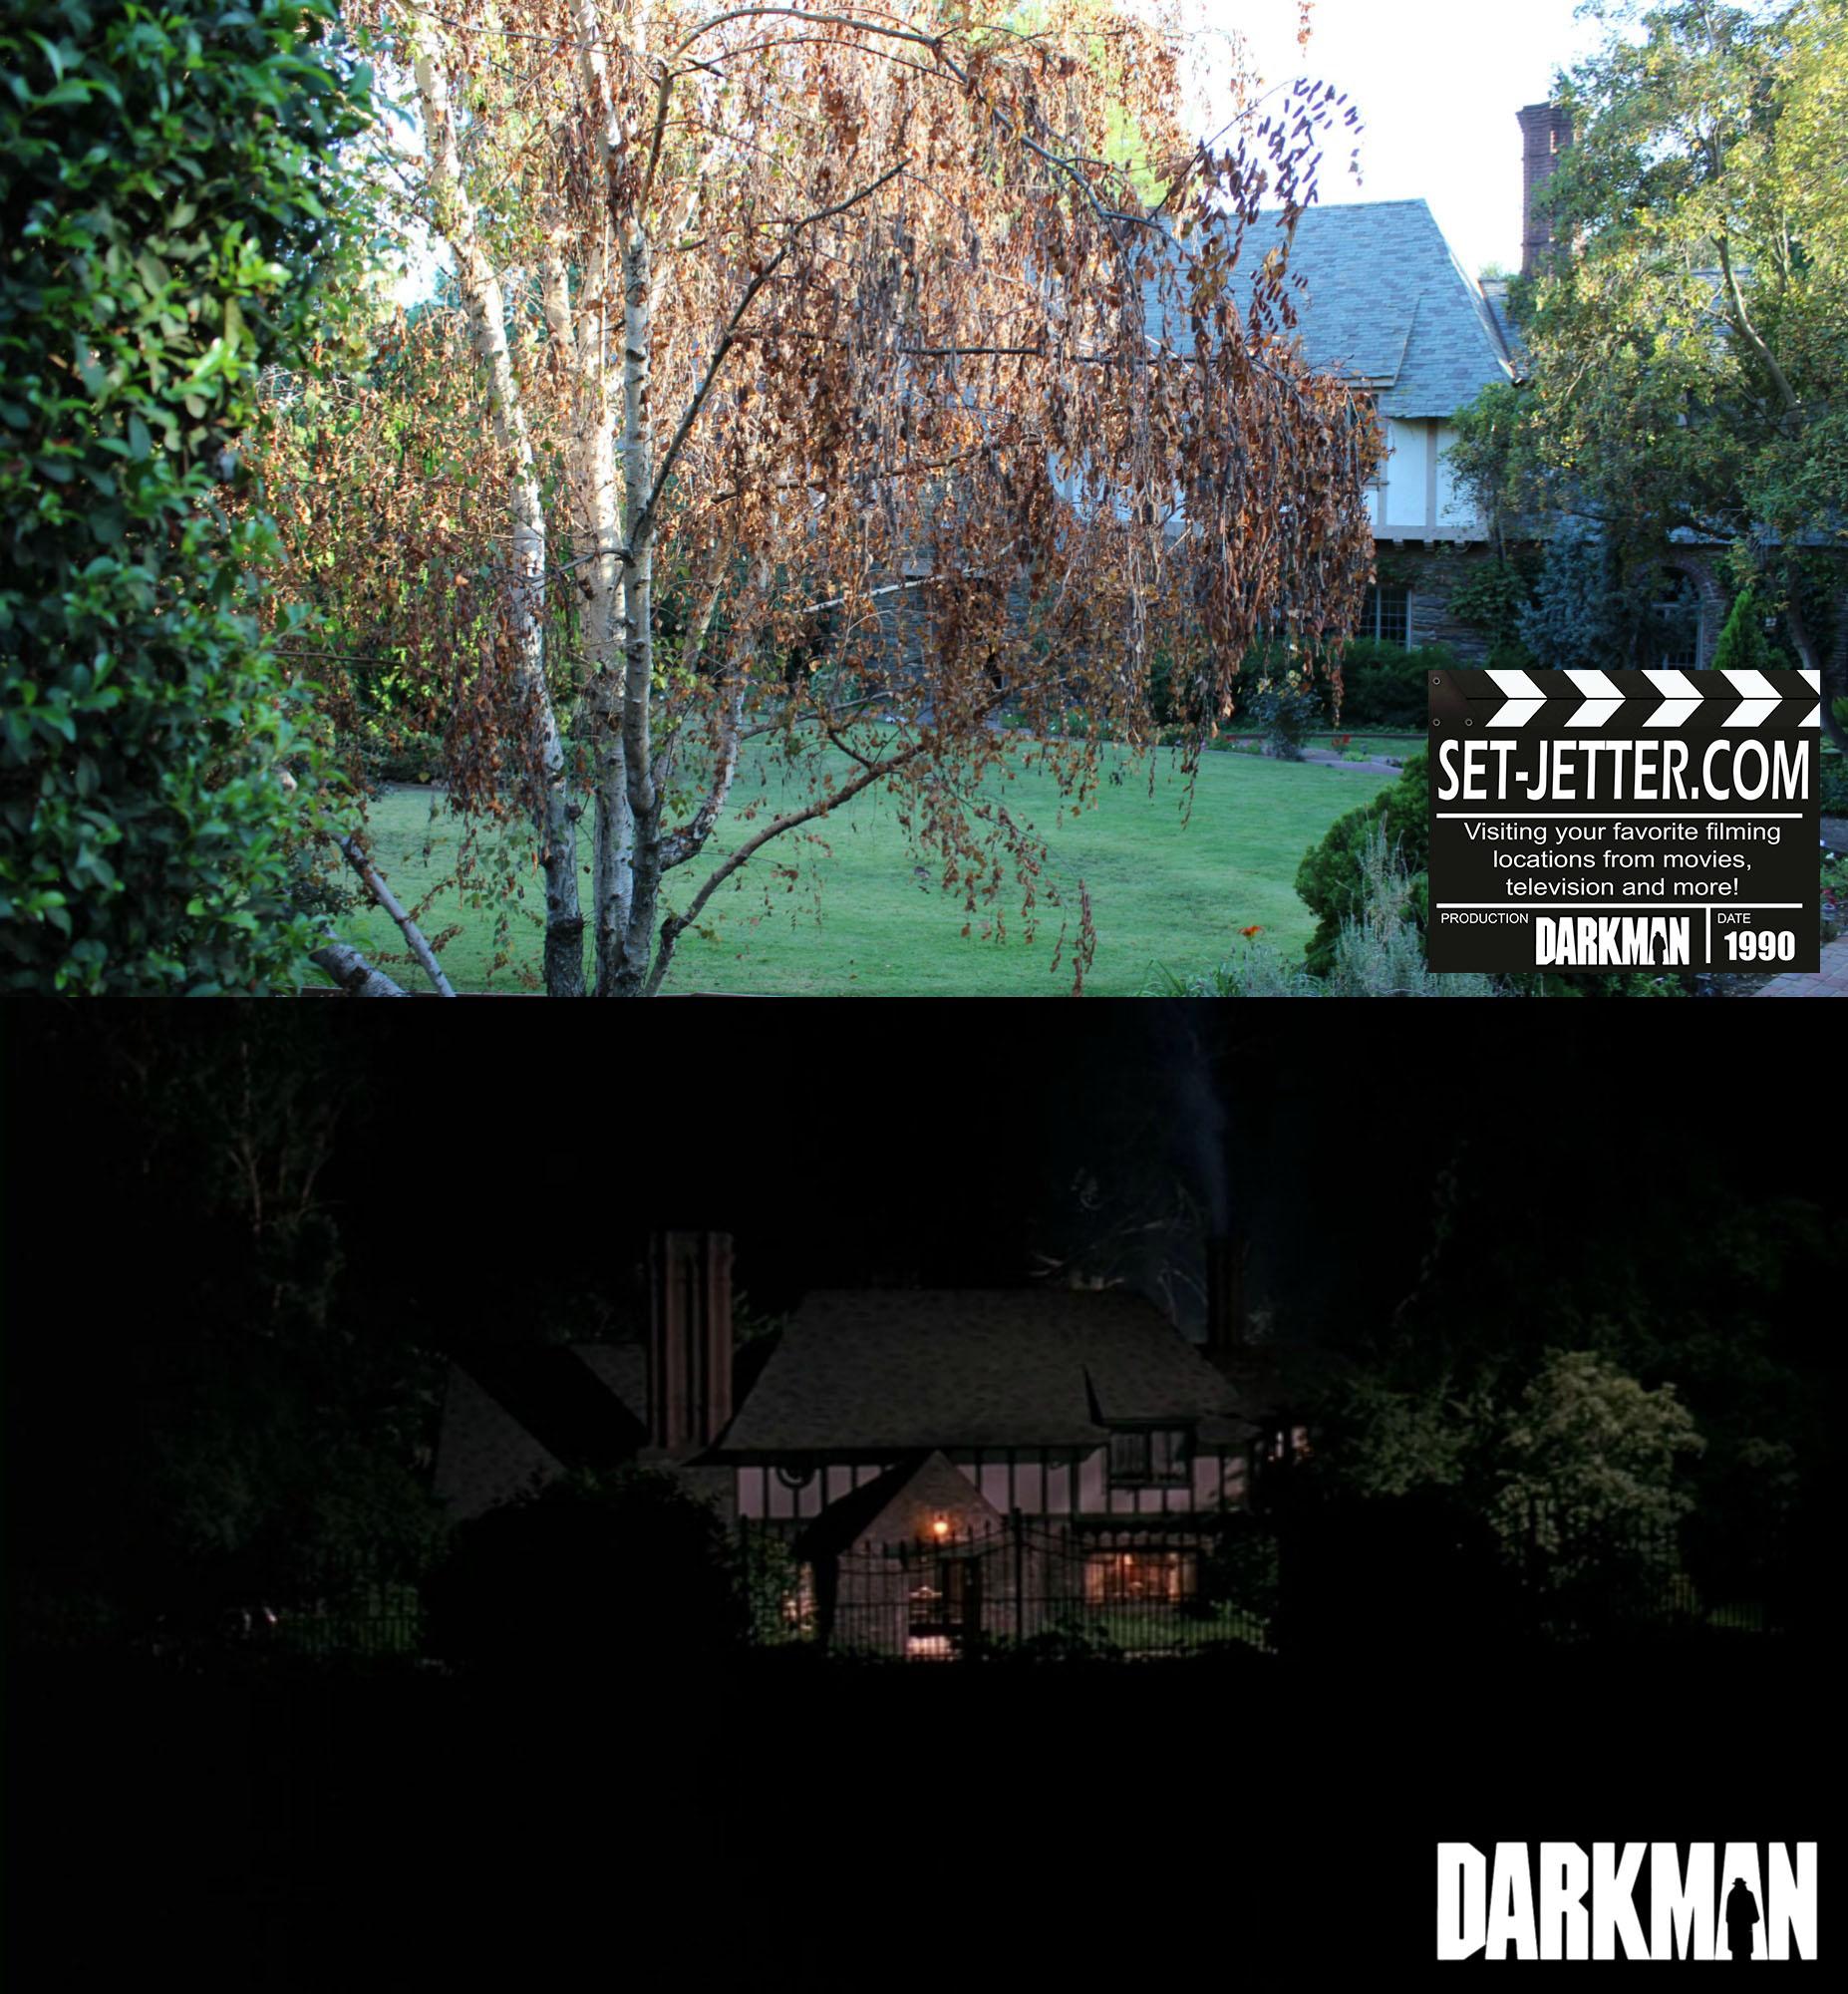 Darkman 19.jpg